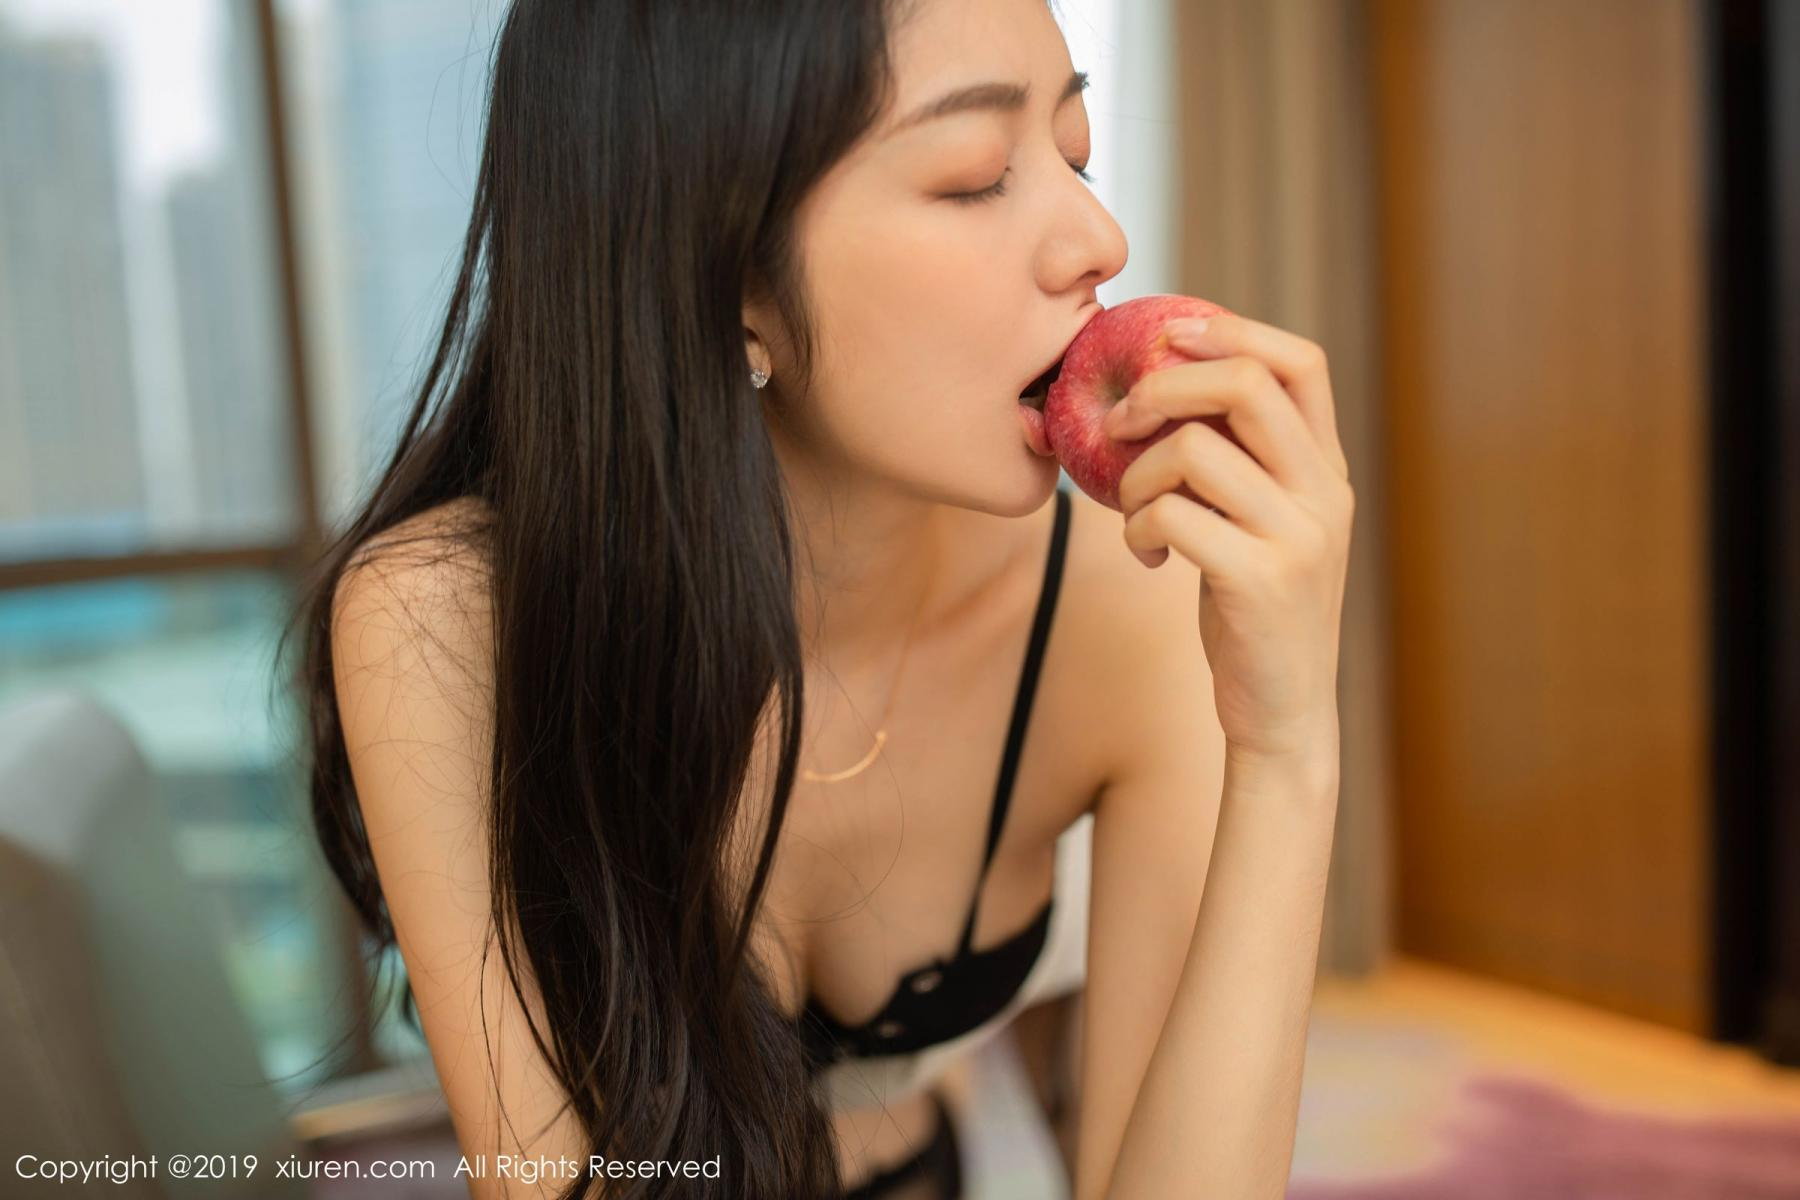 [XiuRen] Vol.1821 Come to my room and sit after you get off work 42P, Black Silk, Di Yi, Xiuren